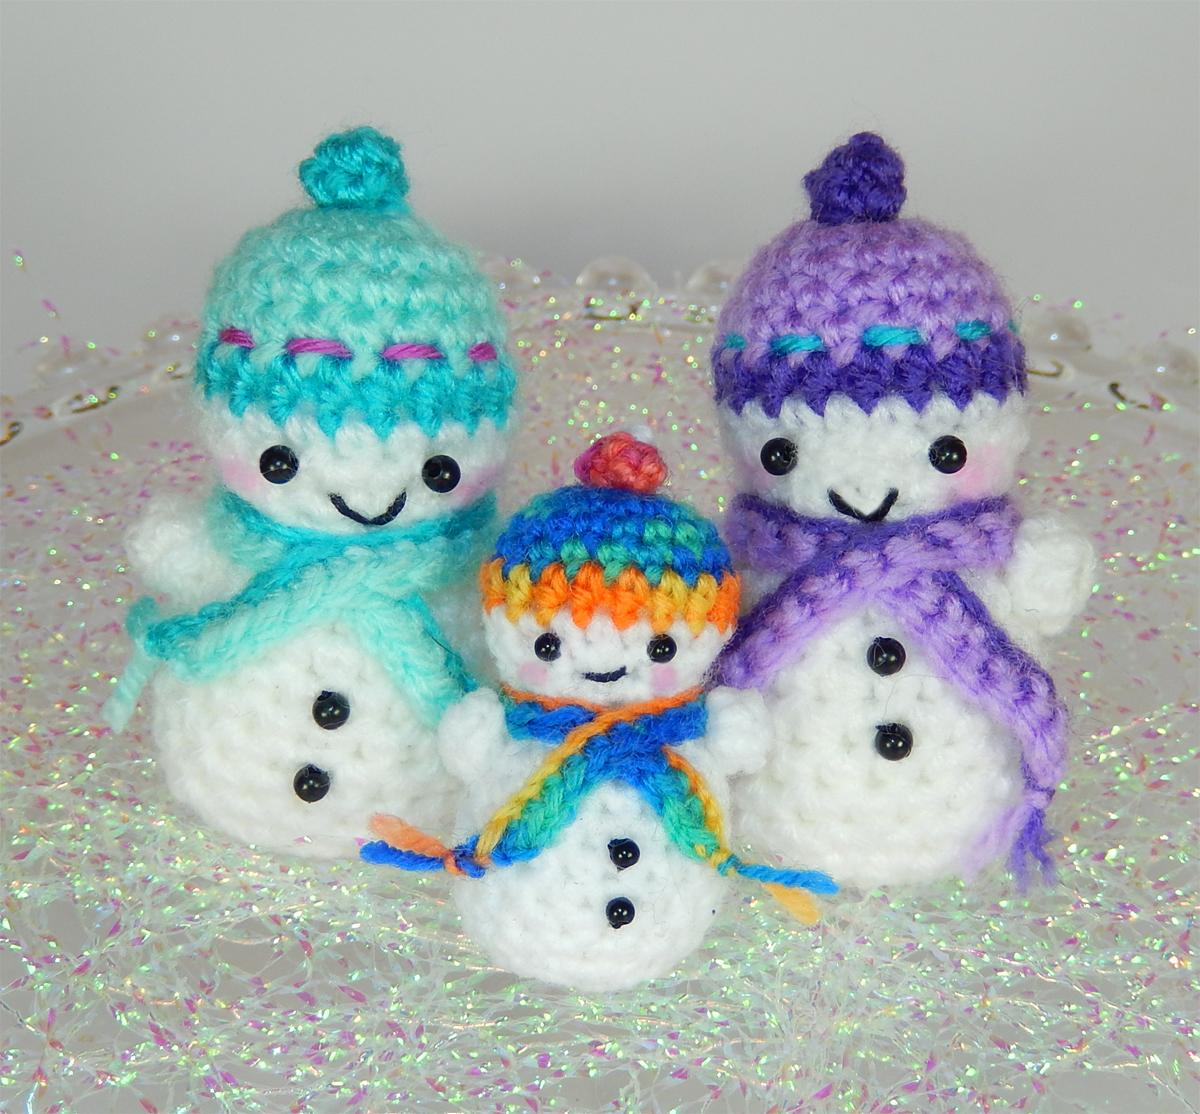 Teeny Tiny Snowmen | Moji-Moji Design